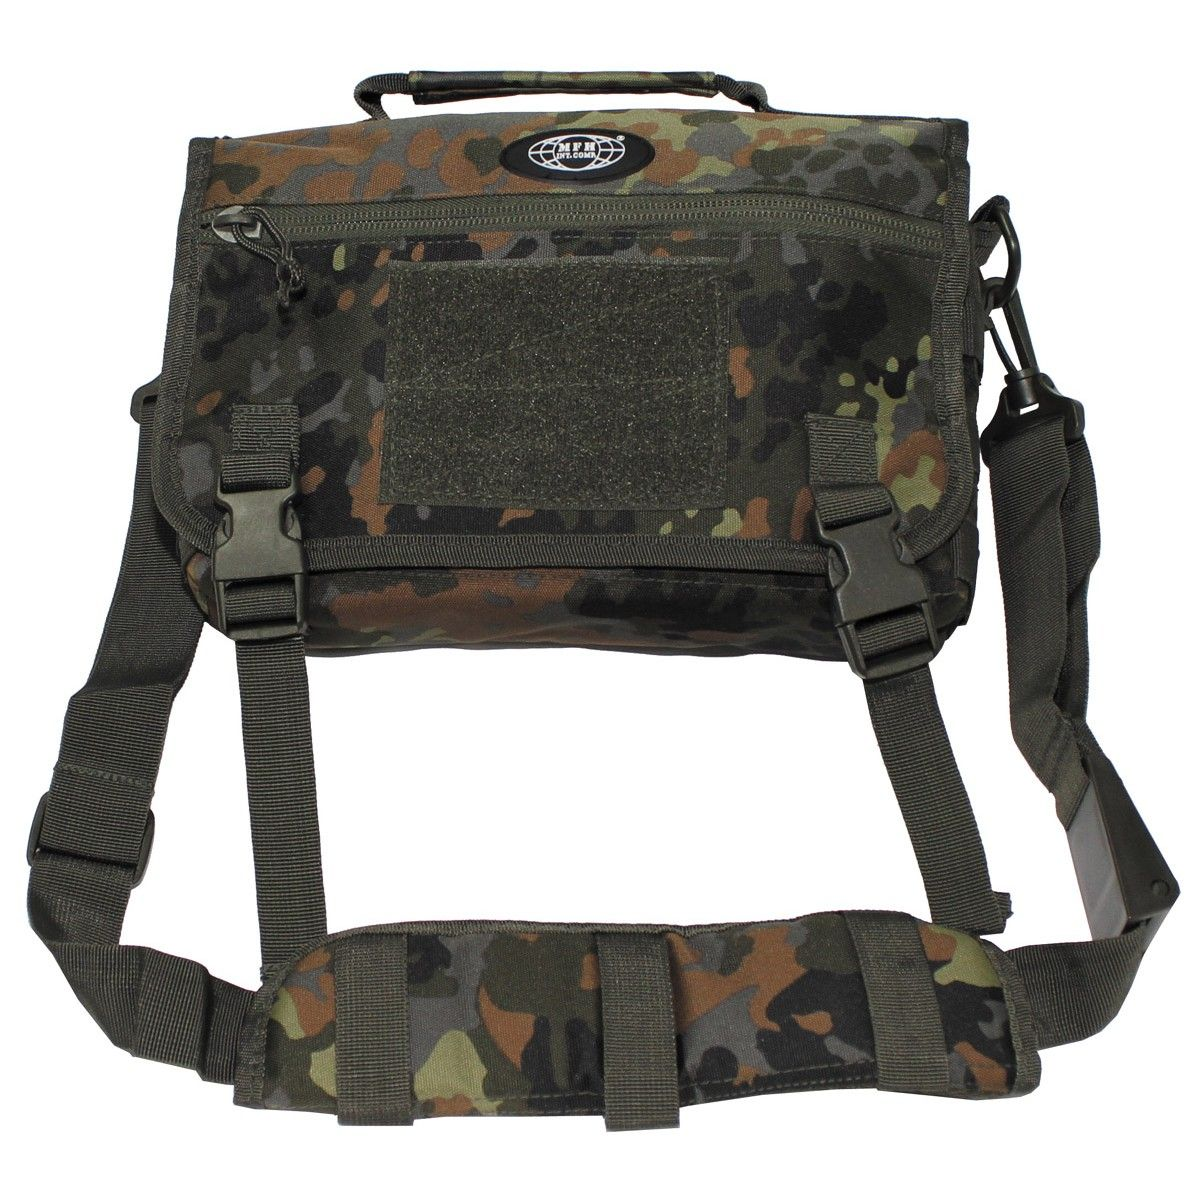 Molle taška přes rameno BW